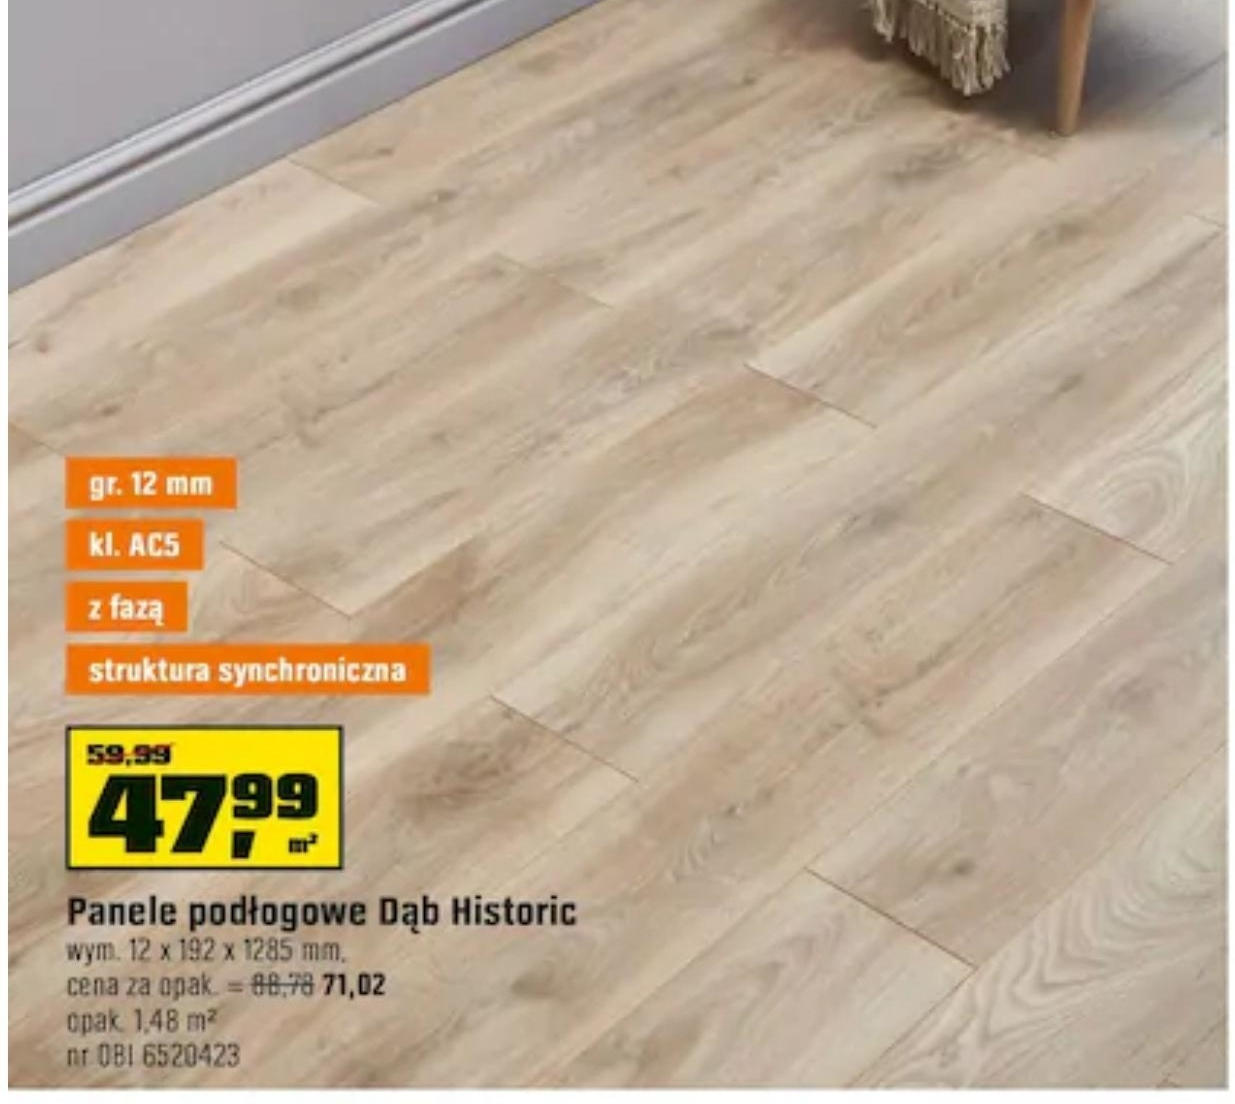 Panele podłogowe niska cena